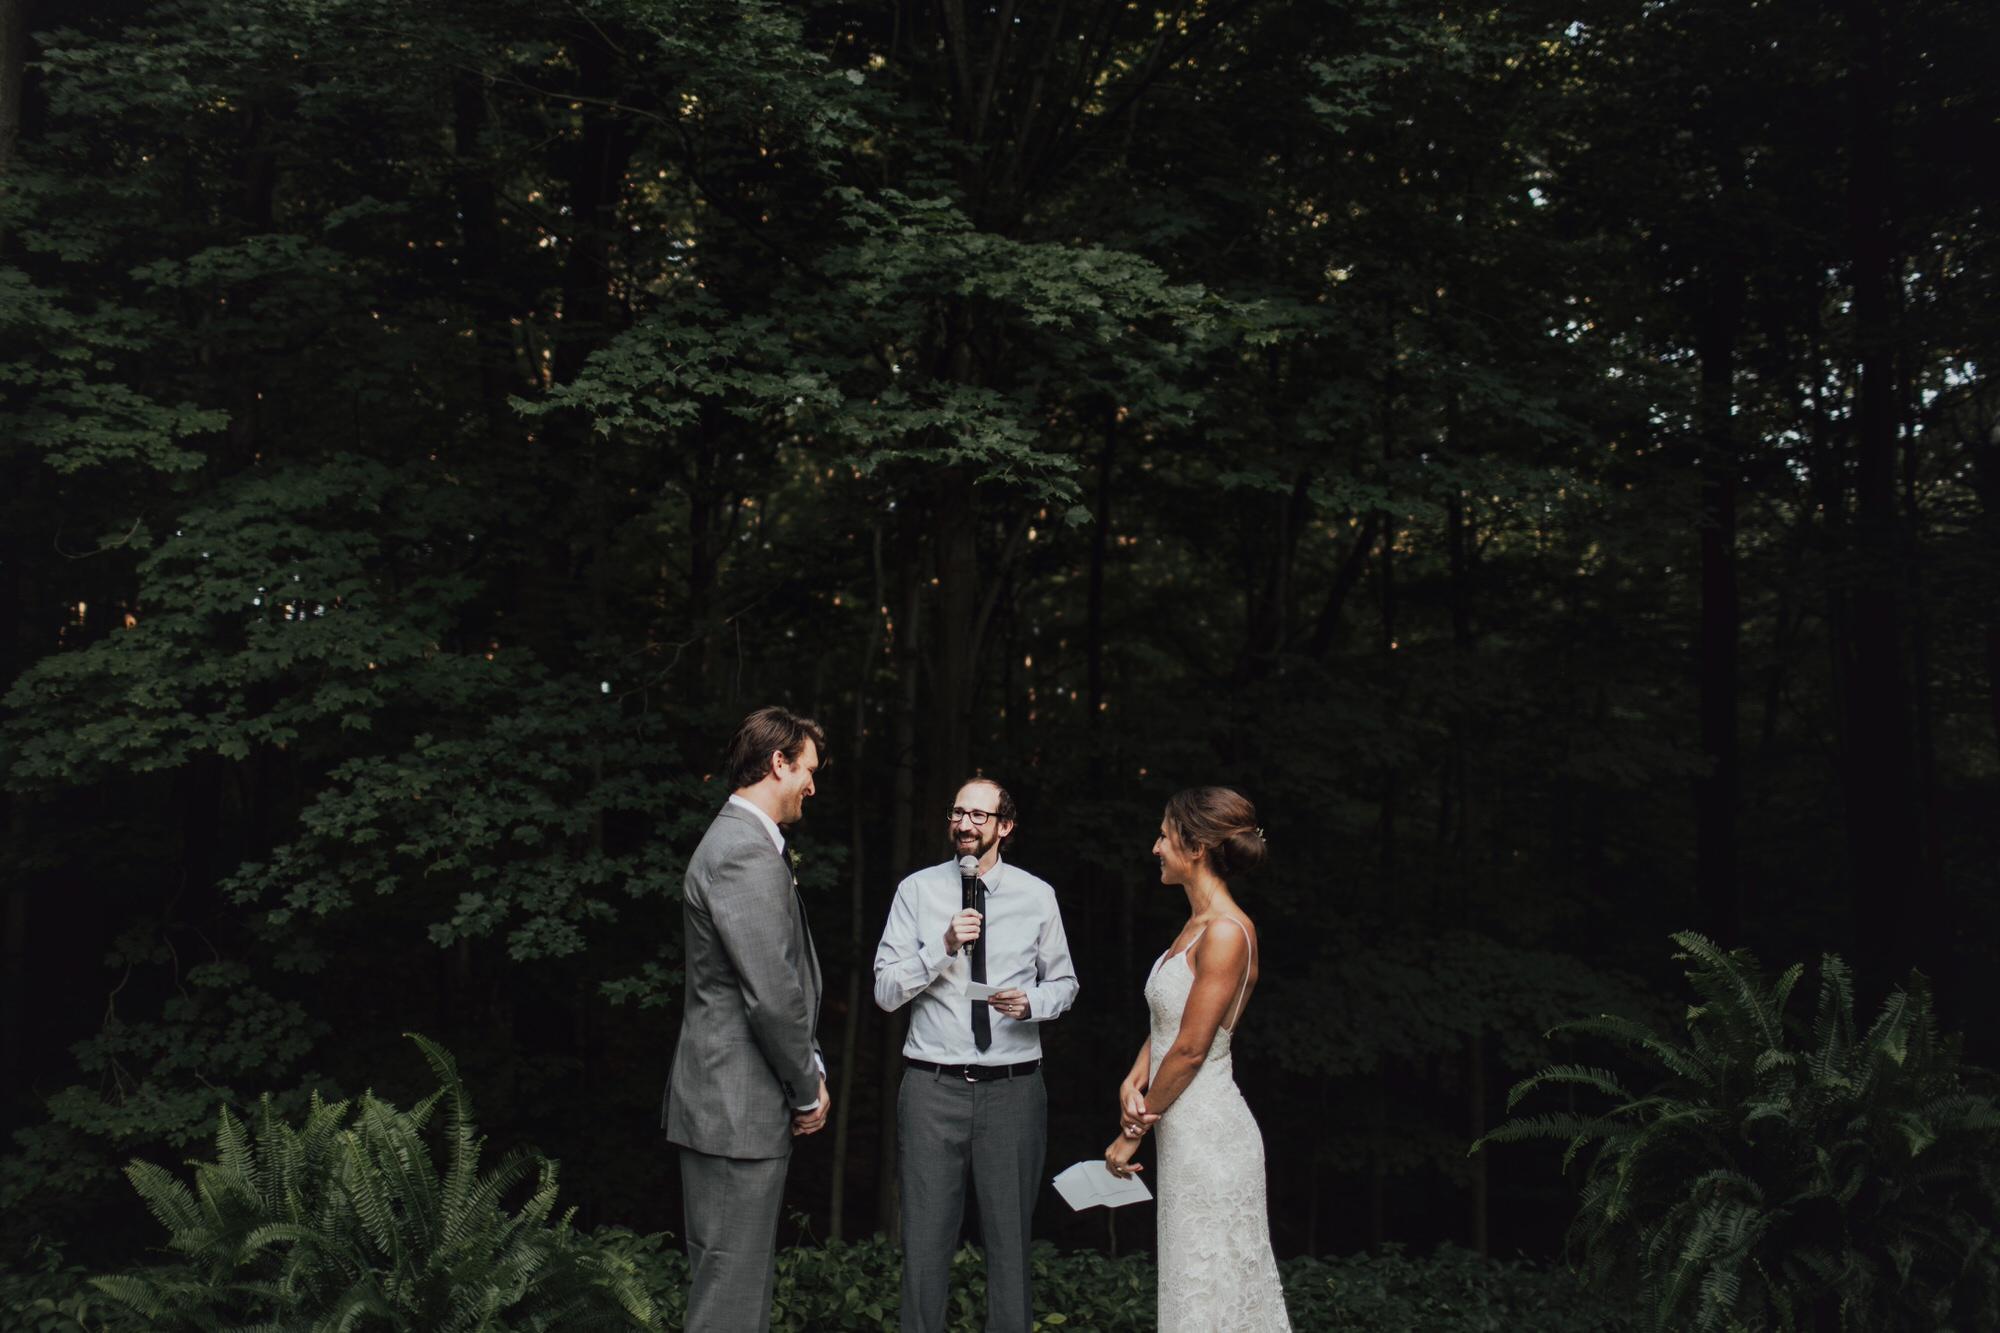 emily-aaron-rochester-new-york-wedding-photographer-75.JPG